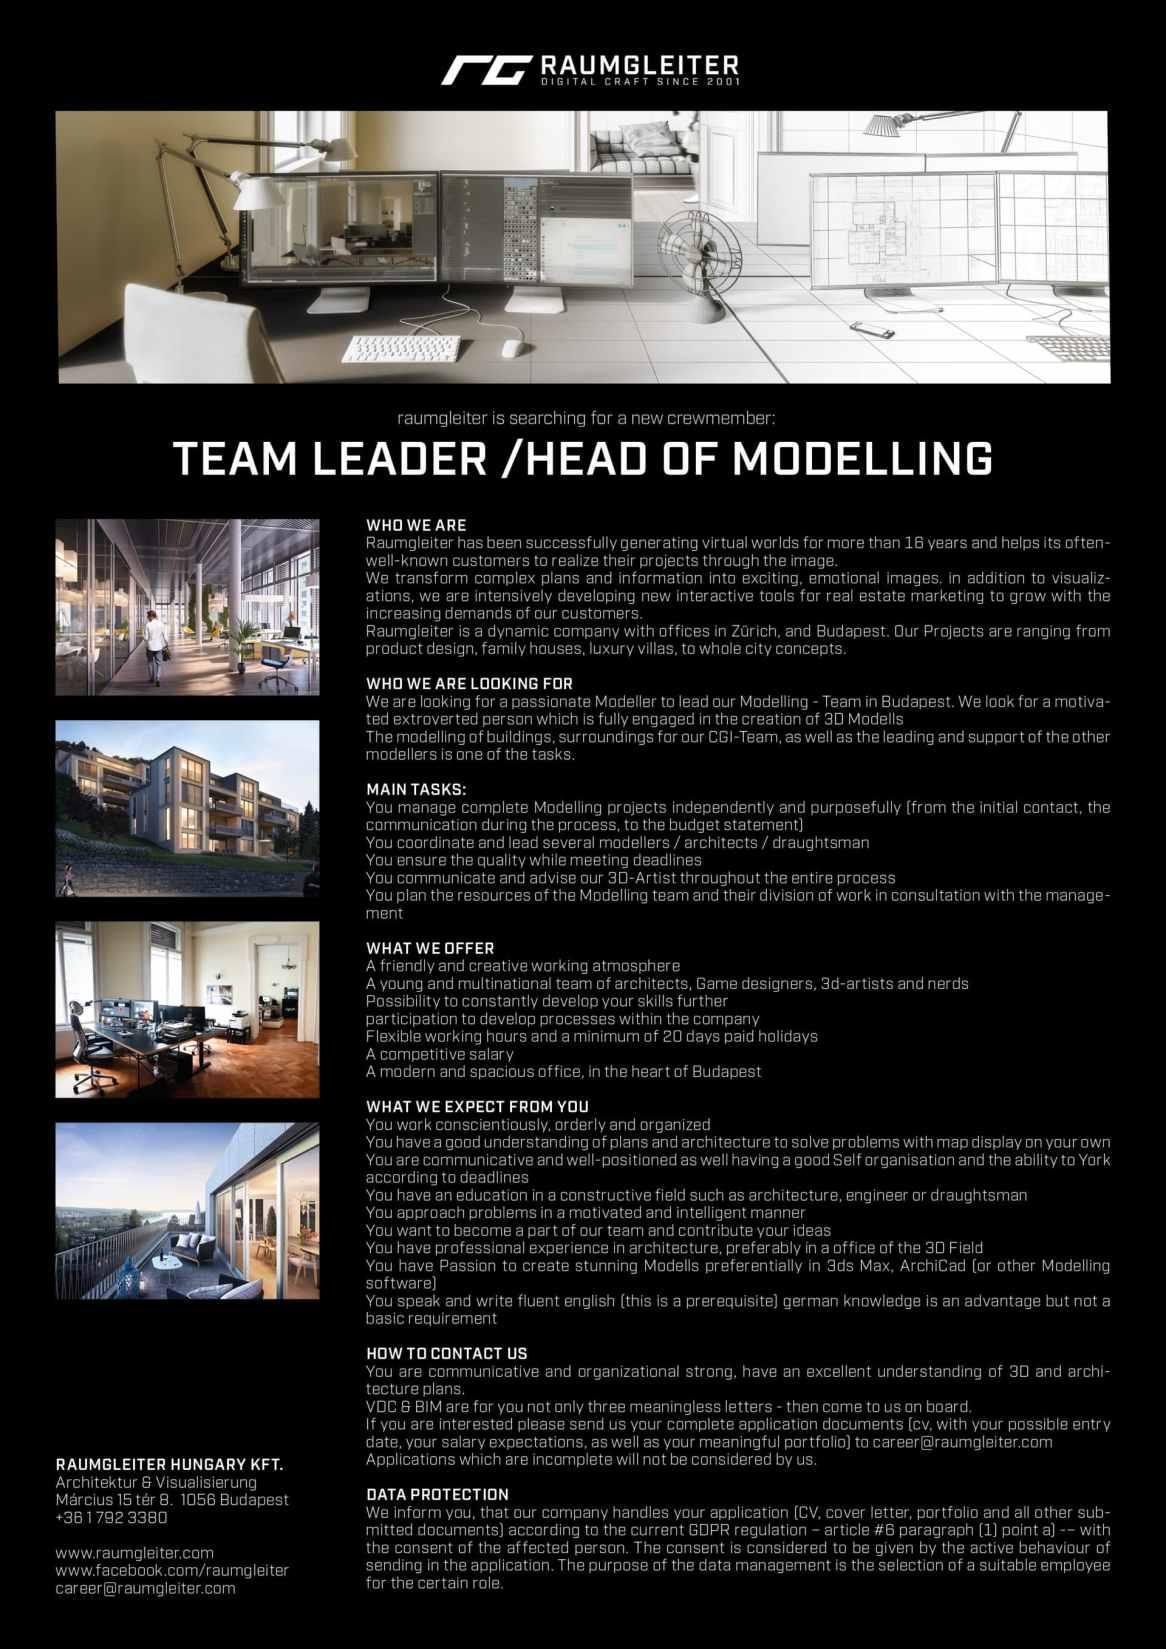 TEAM LEADER /head of modelling